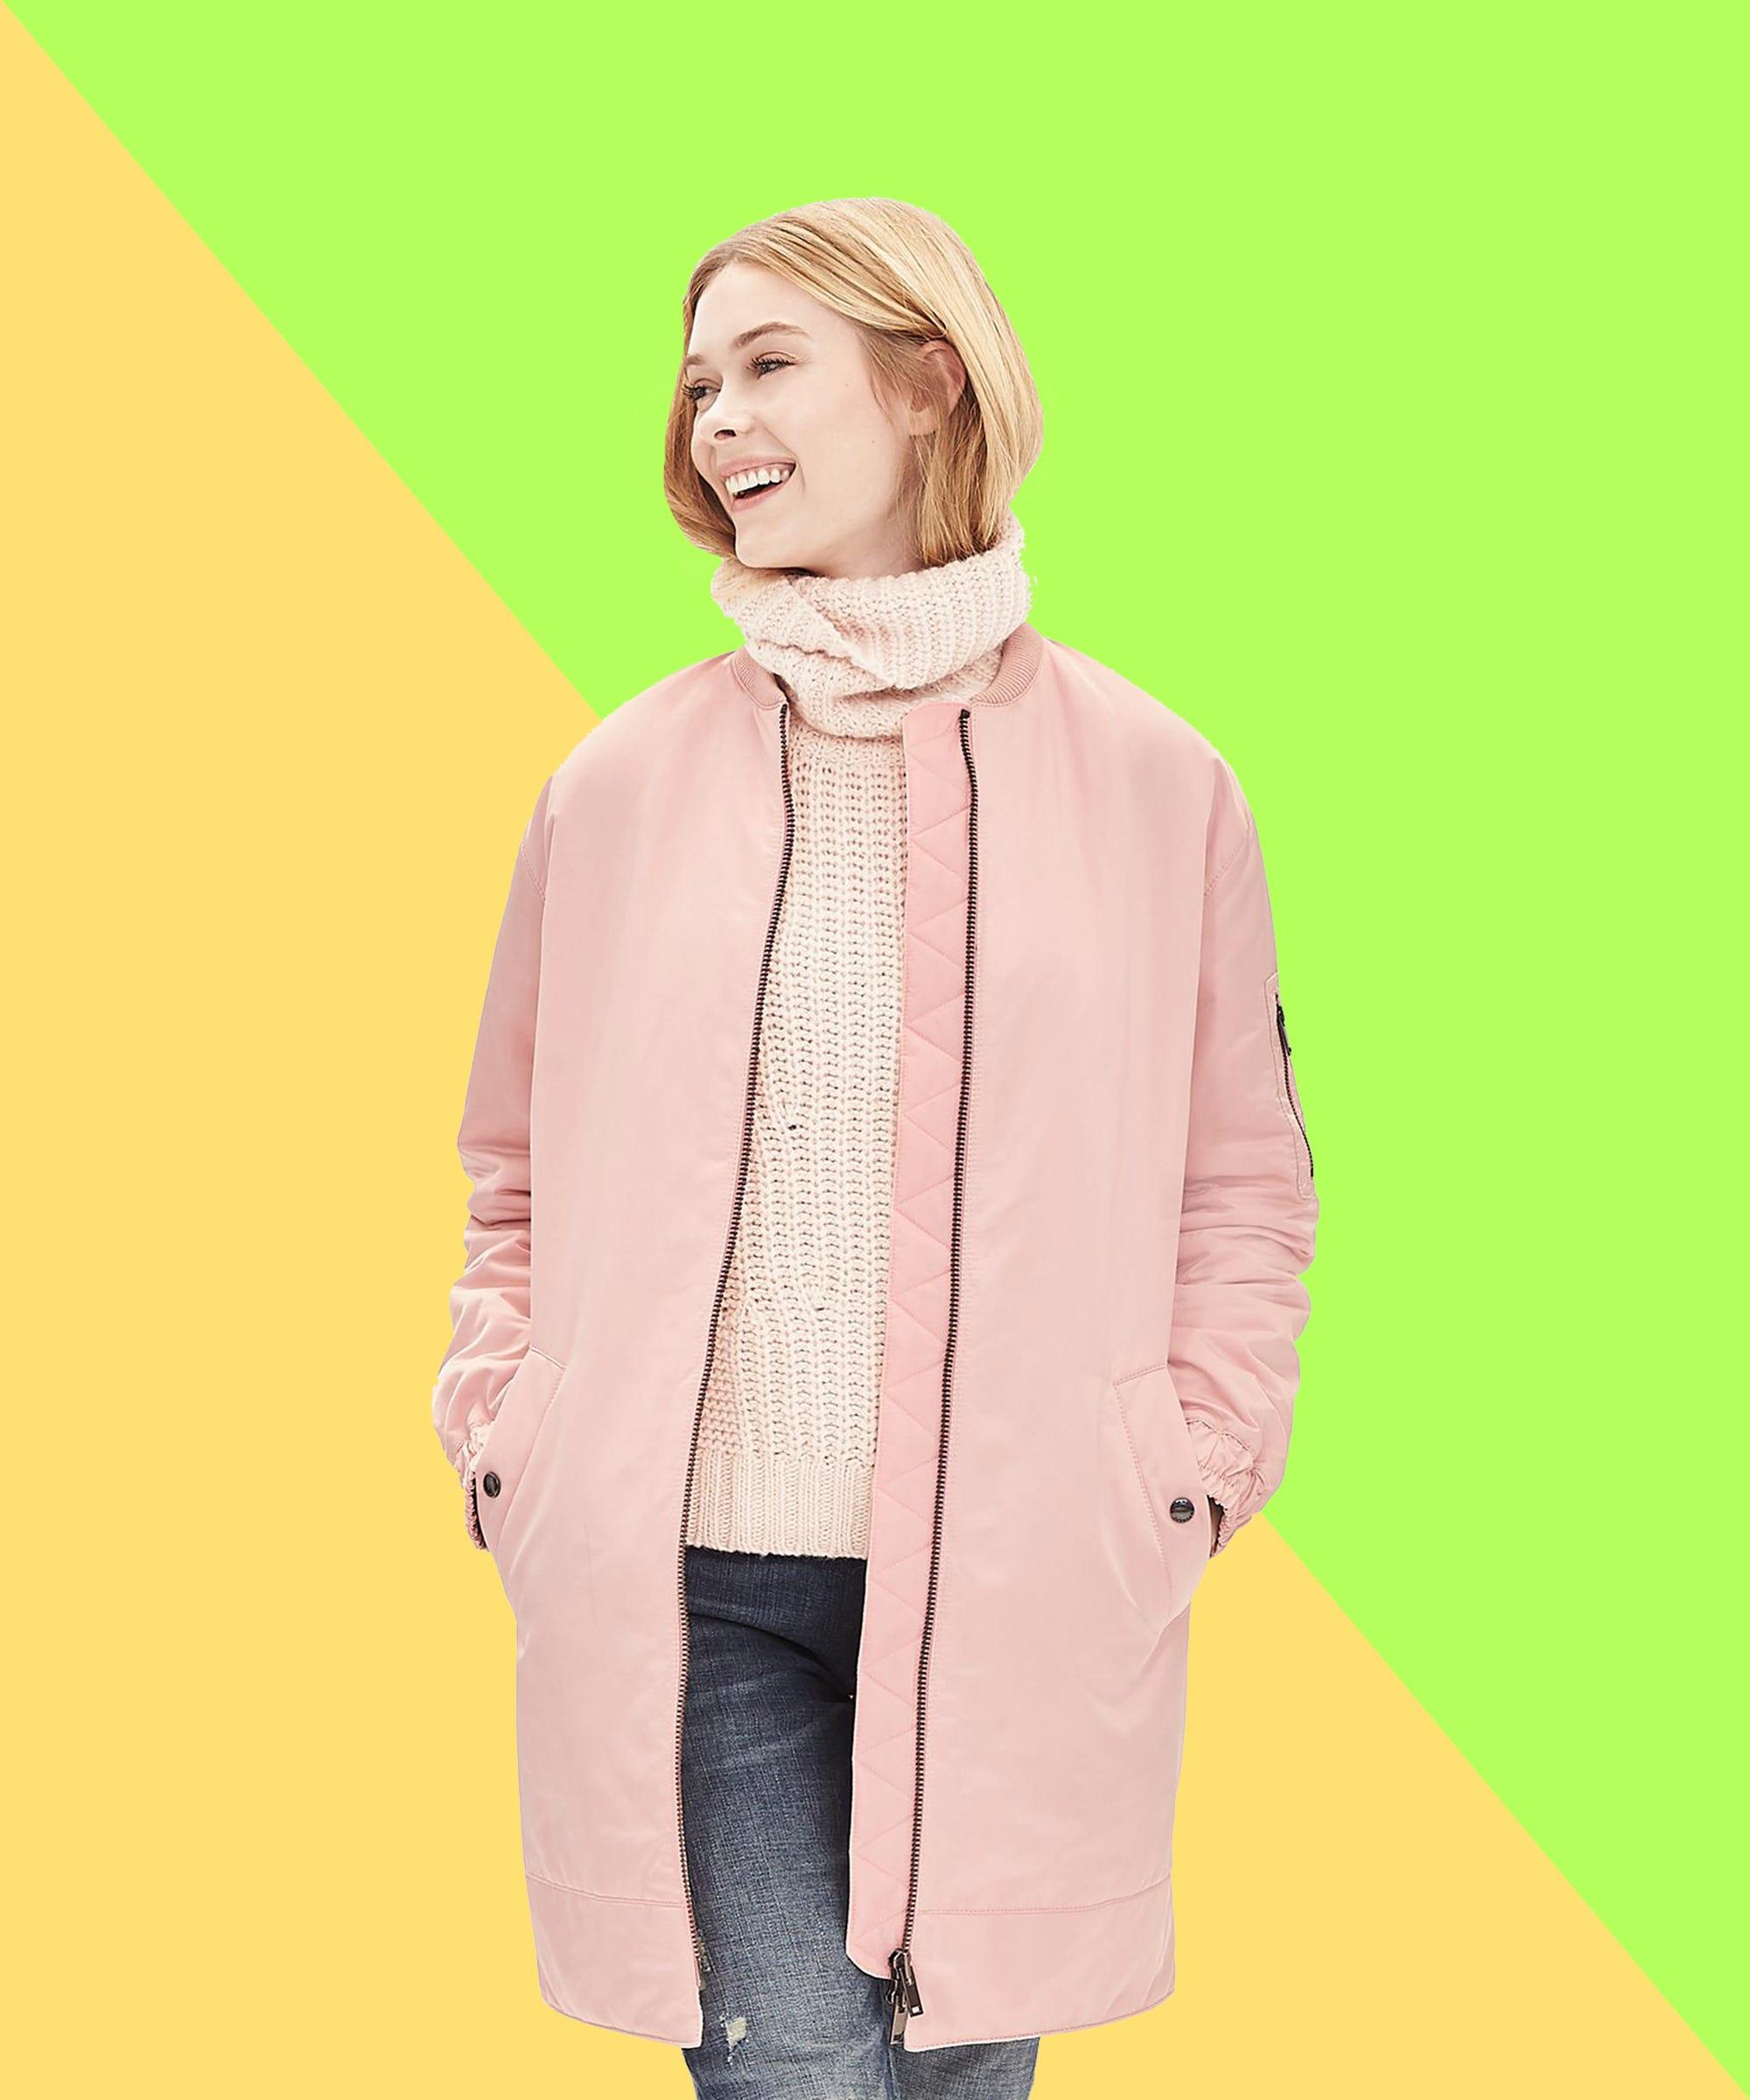 c8e44161b1 Winter Coats For Every Budget